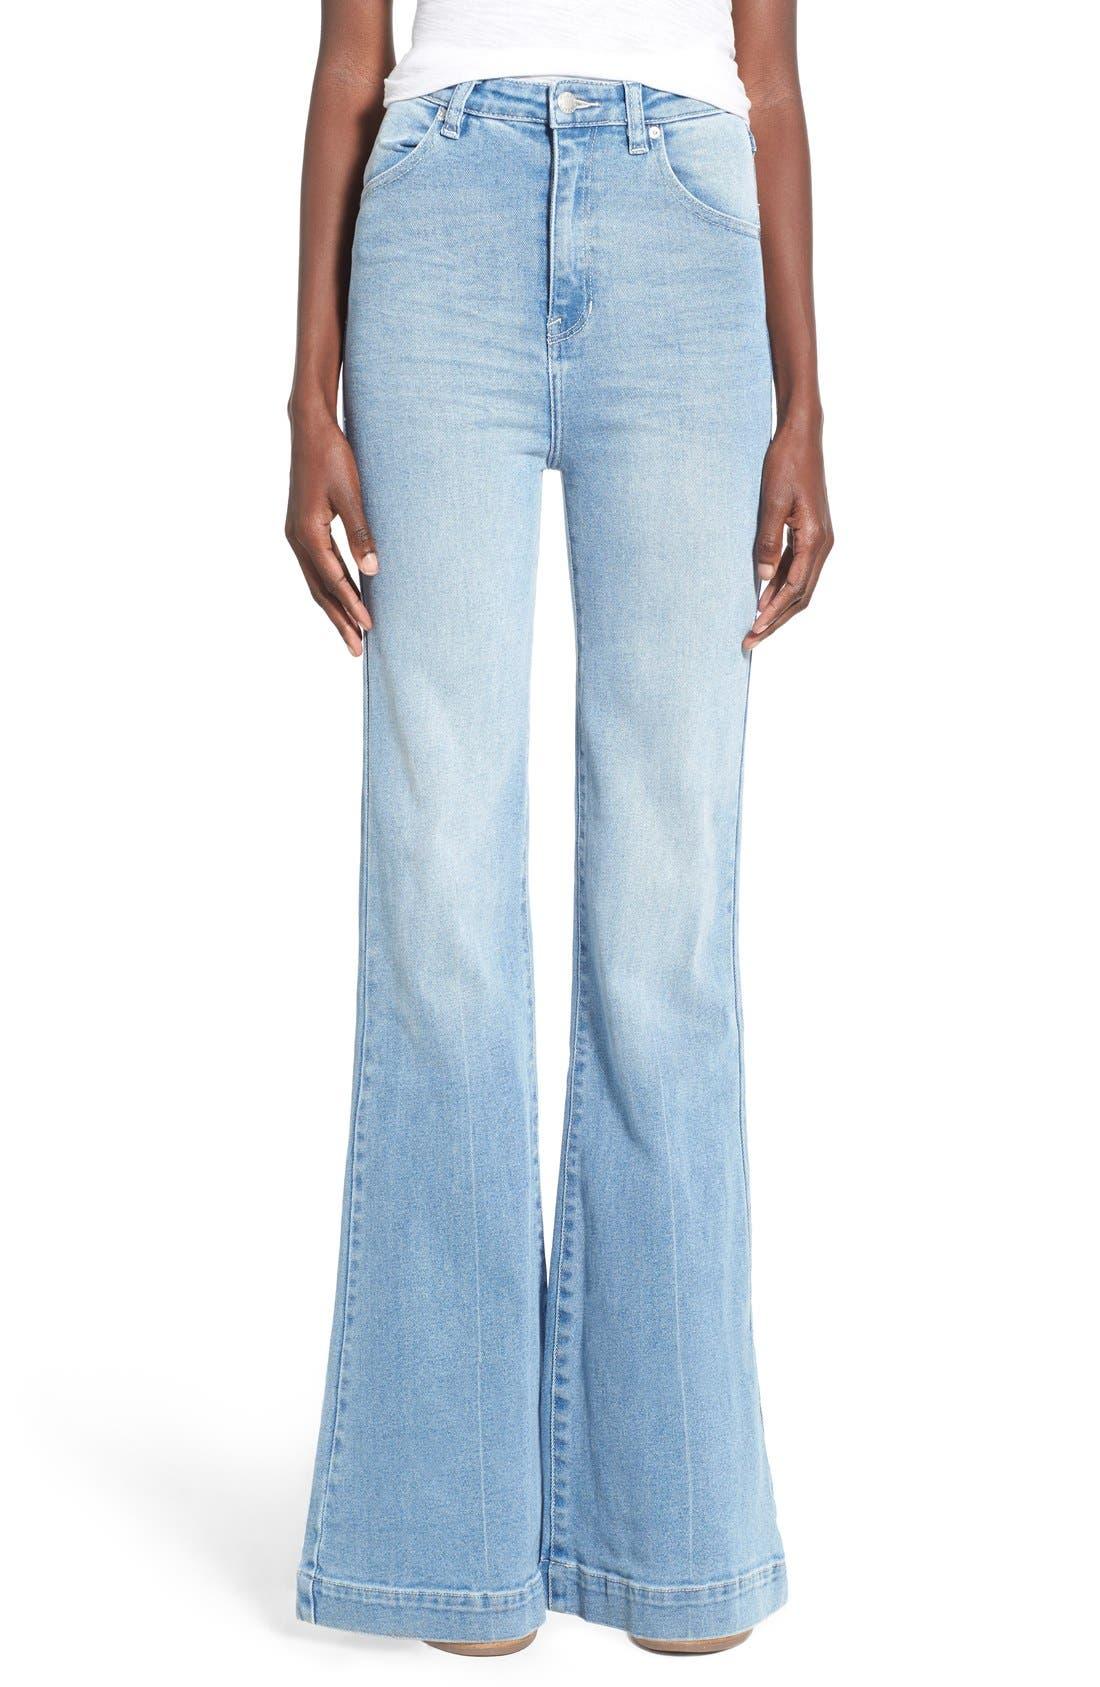 ROLLA'S 'East Coast' Flare Jeans, Main, color, 430